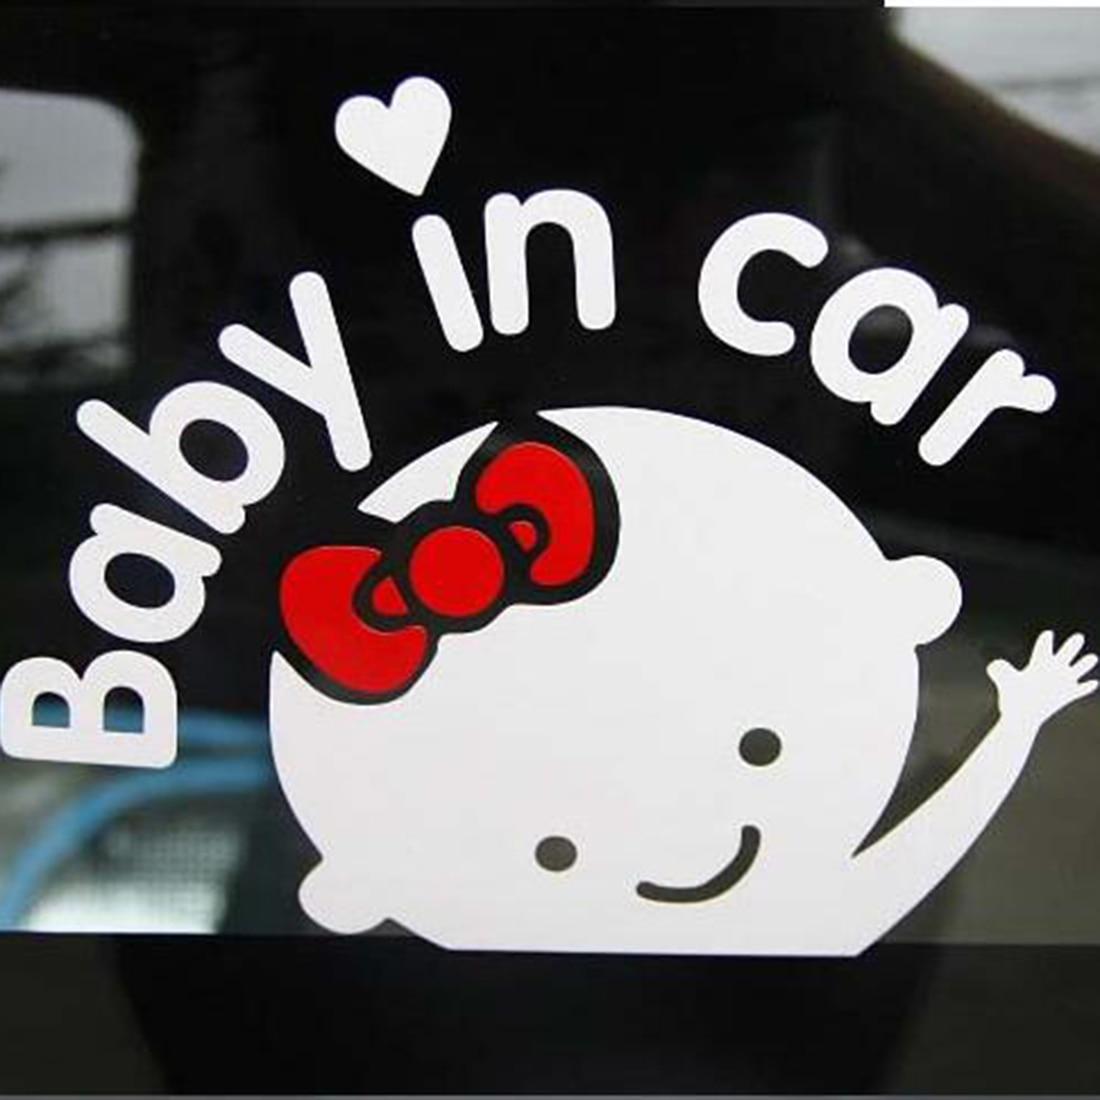 Dewtreetali Car-Styling Cartoon Car Stickers Vinyl Decal Baby on Board Baby in car Window Rear Windshield Cute Car Sticker 3d car stickers love live nishikino maki anime jdm vinyl car decal window wiper decal rear windshield car styling decor sticker